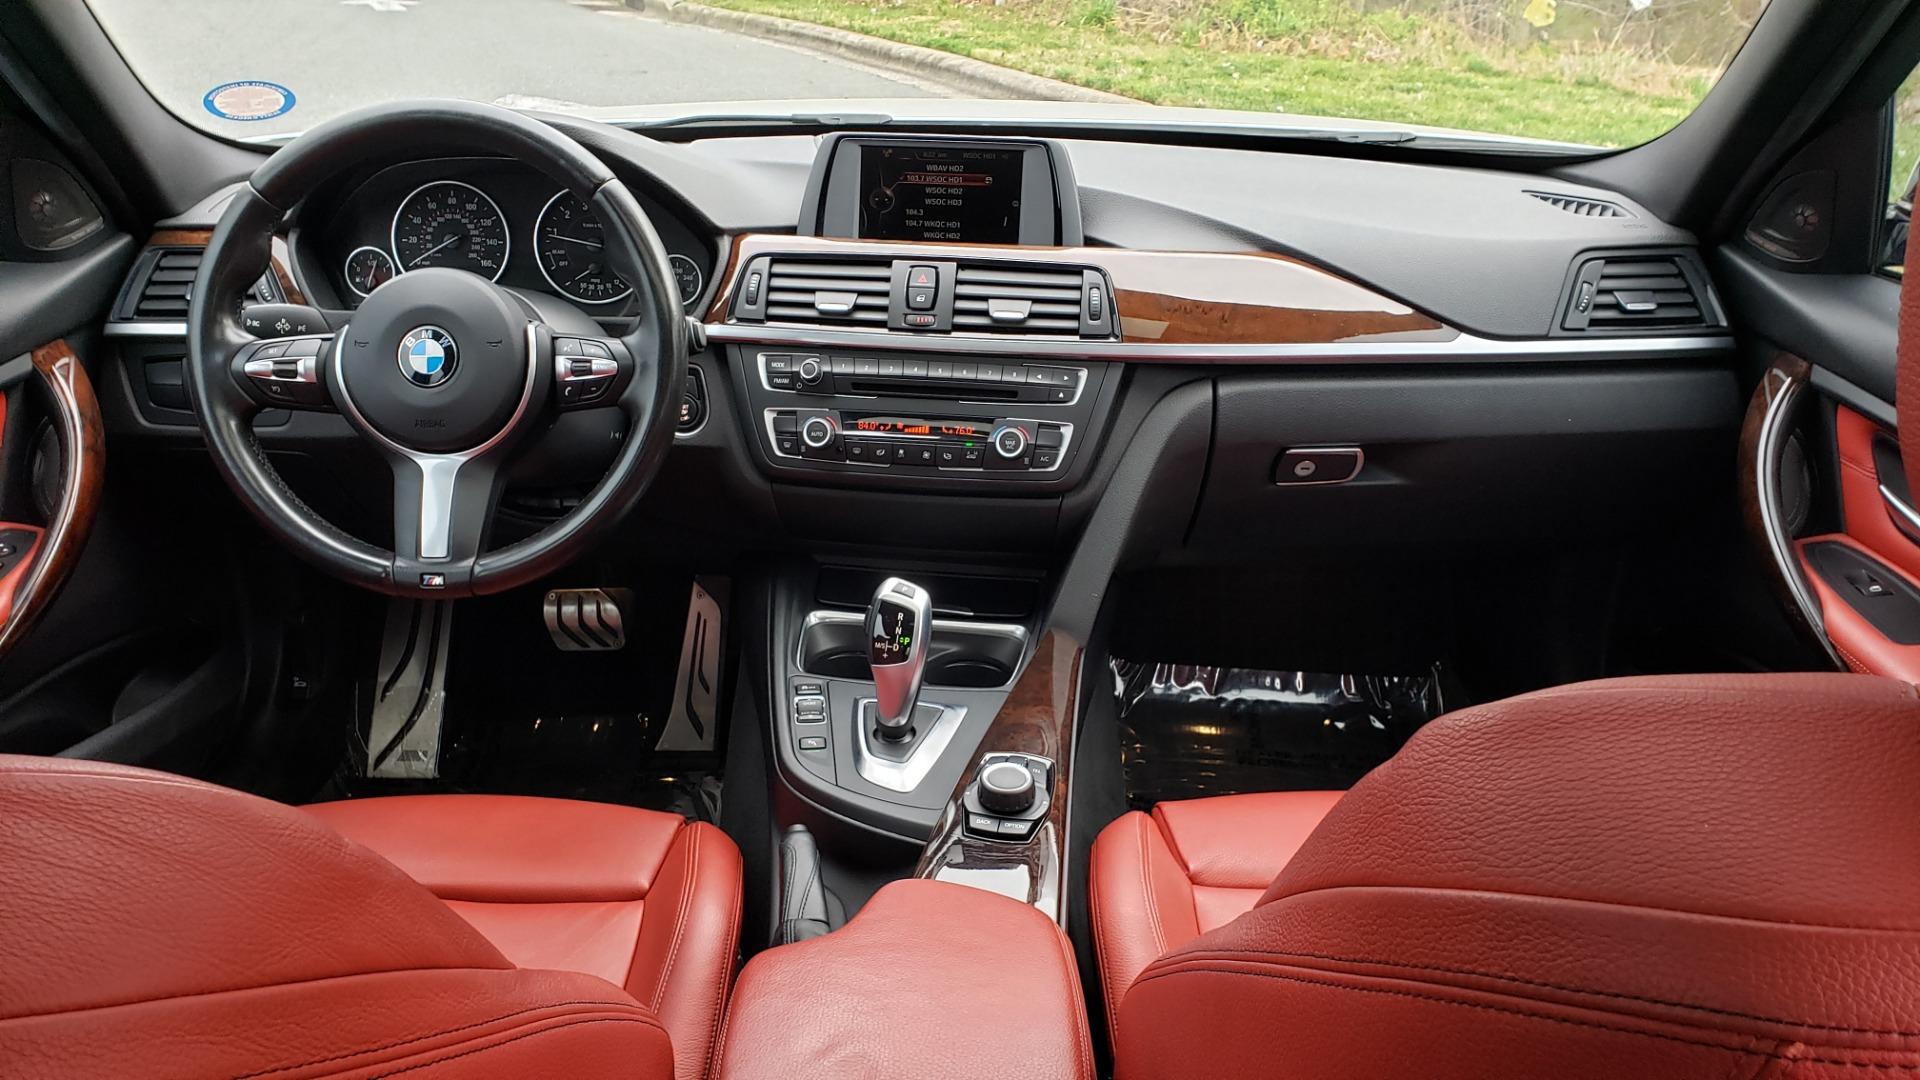 Used 2015 BMW 3 Series 335I M-SPORT / PREM PKG / HK SND / SUNROOF / REARVIEW for sale Sold at Formula Imports in Charlotte NC 28227 76